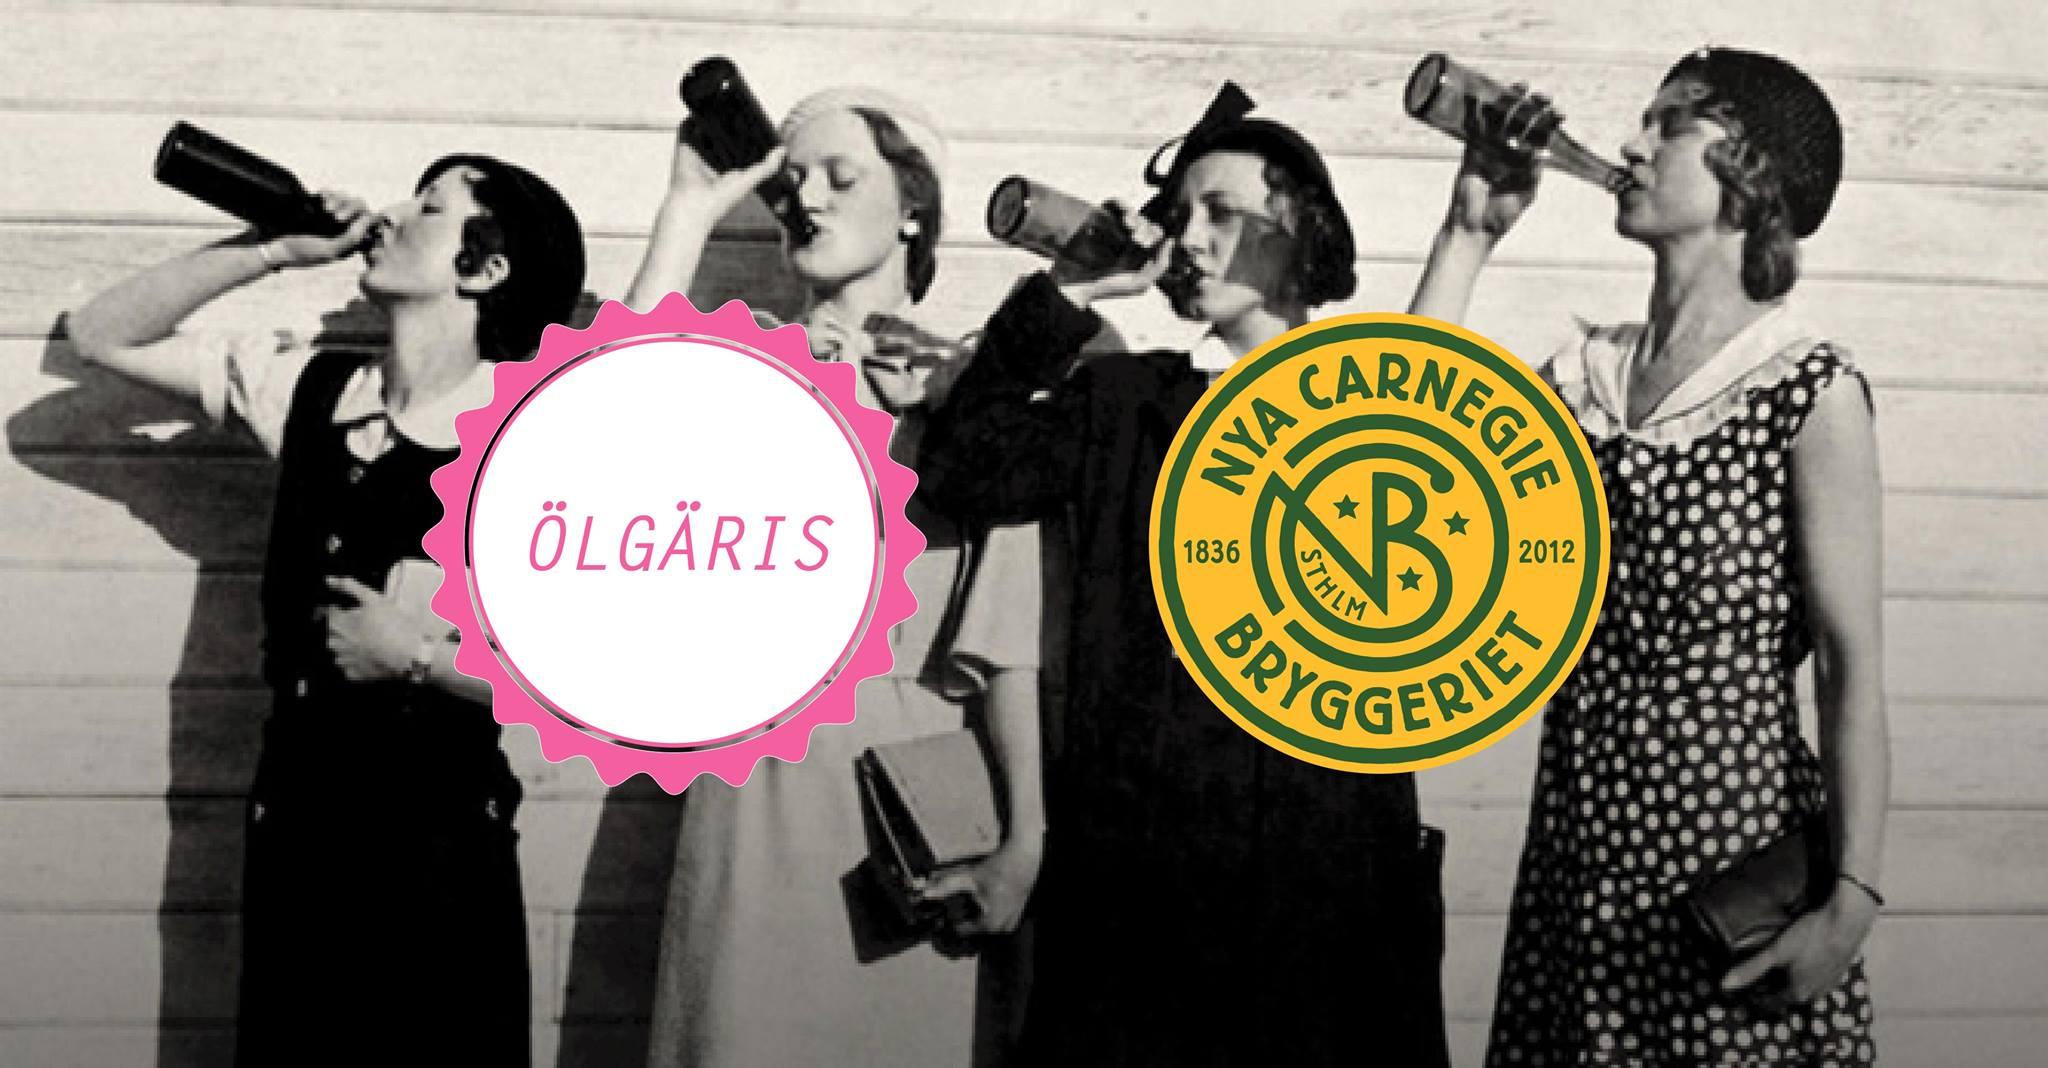 Nya Carnegiebryggeriet x Ölgäris på Grand Öl&Mat.jpg